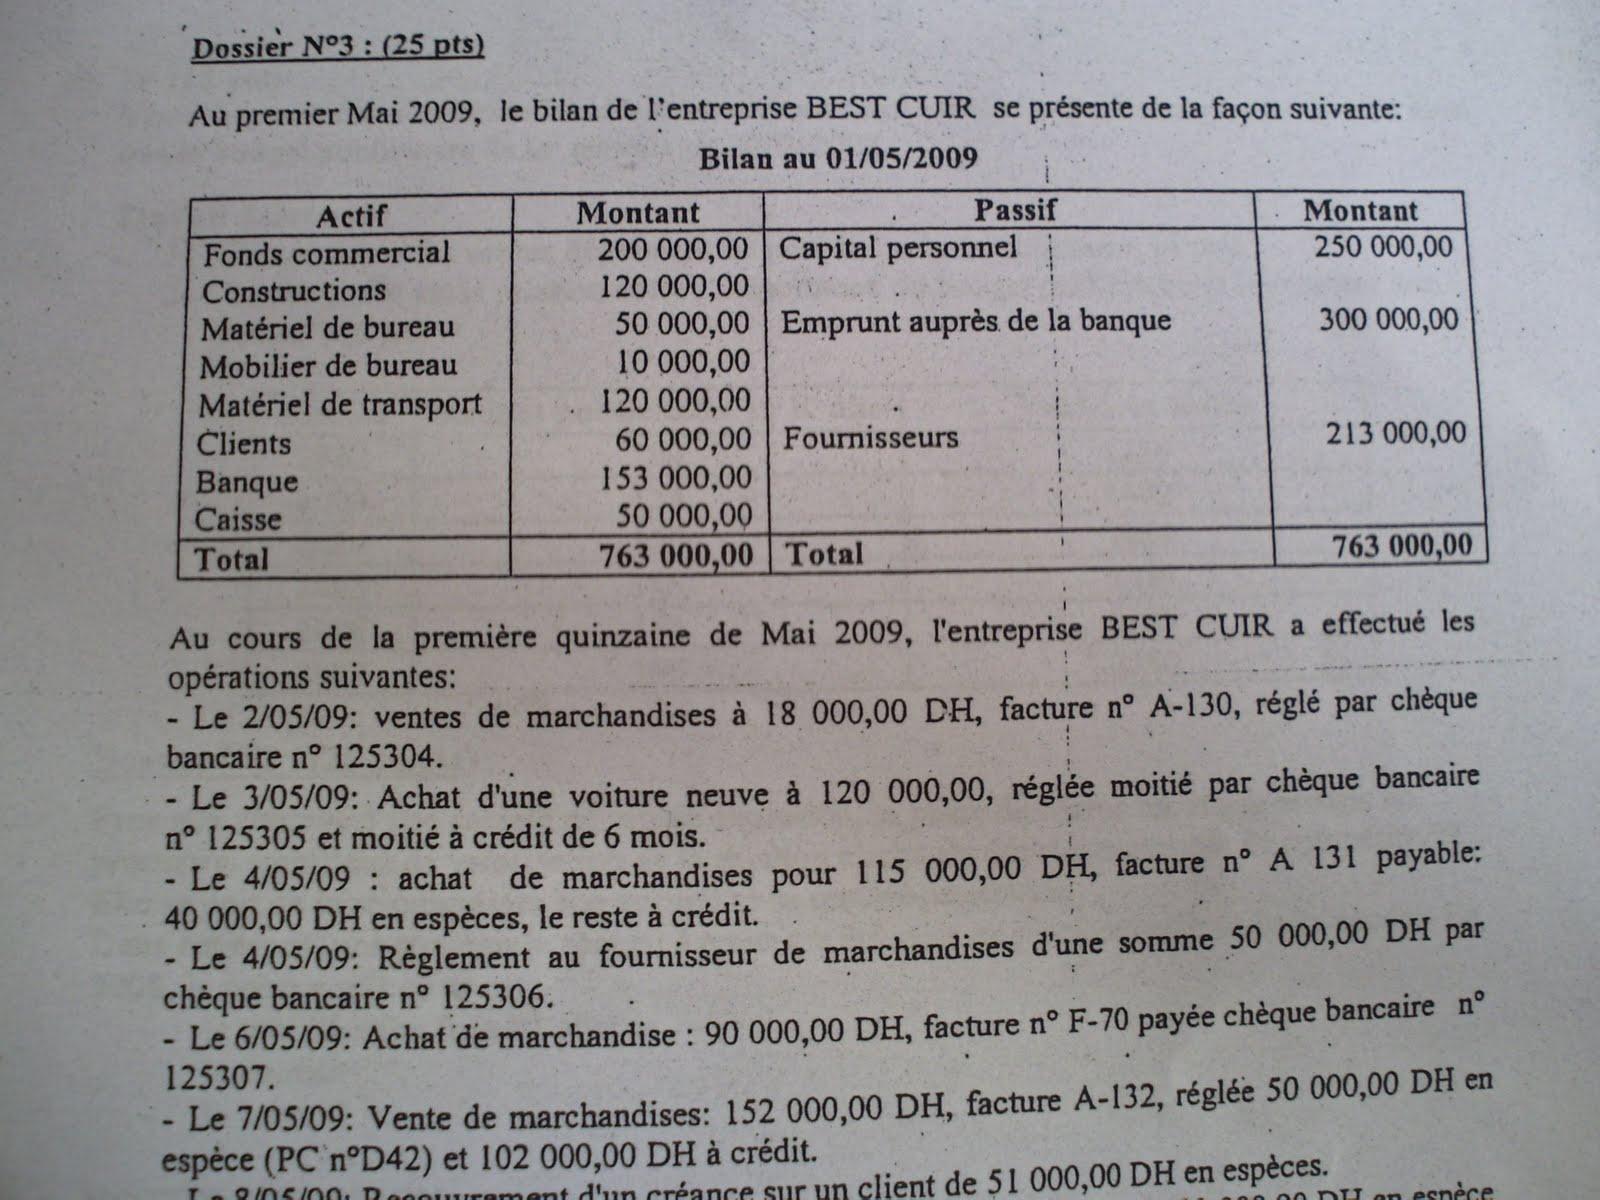 Examen de passage 2009 pratique variante 3 TSC 7